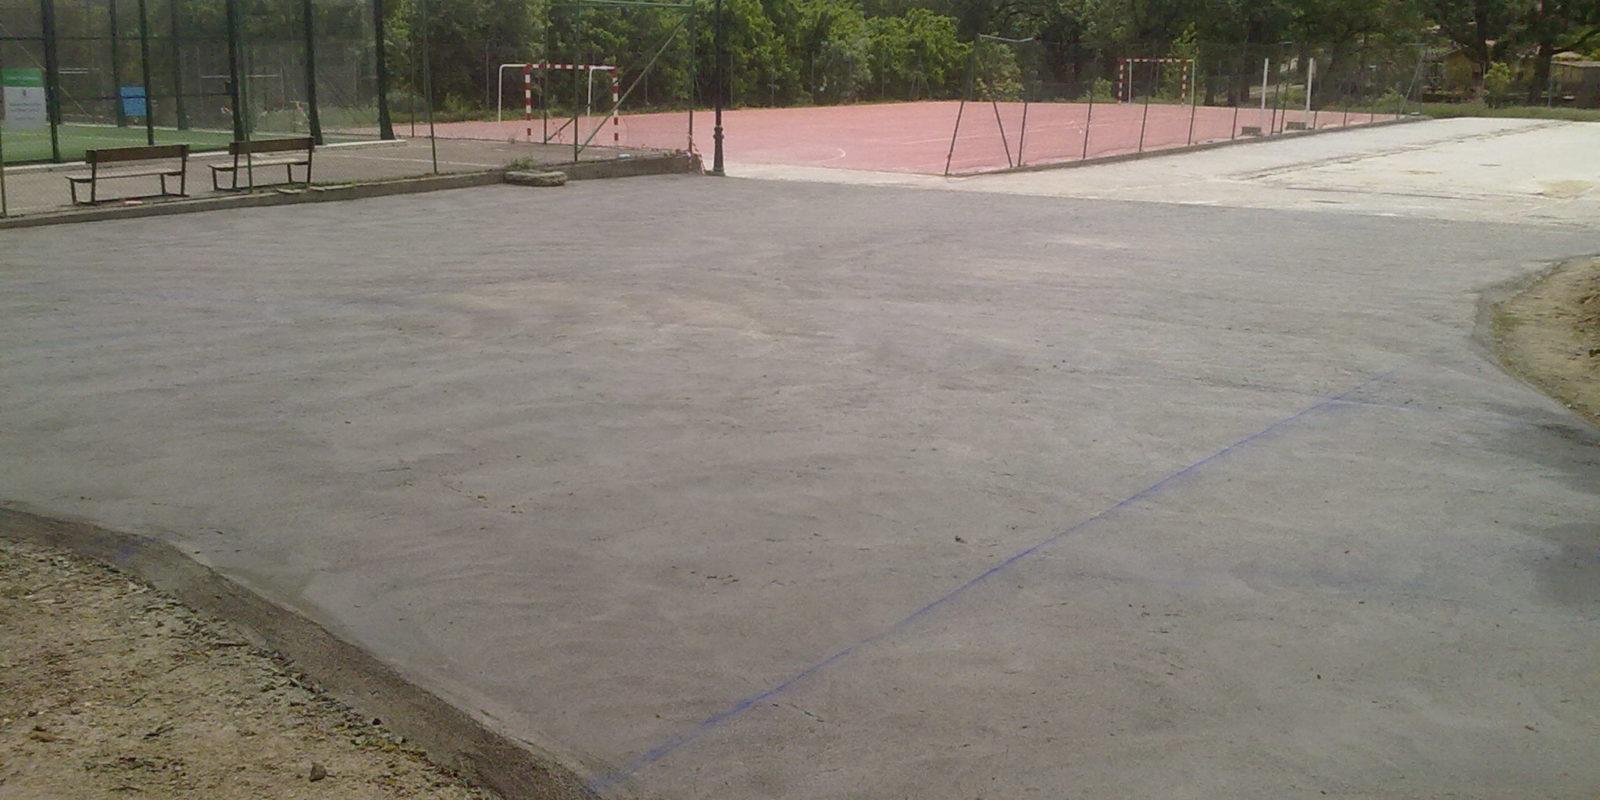 Pavimentaciones instalaciones deportivas Torremenga